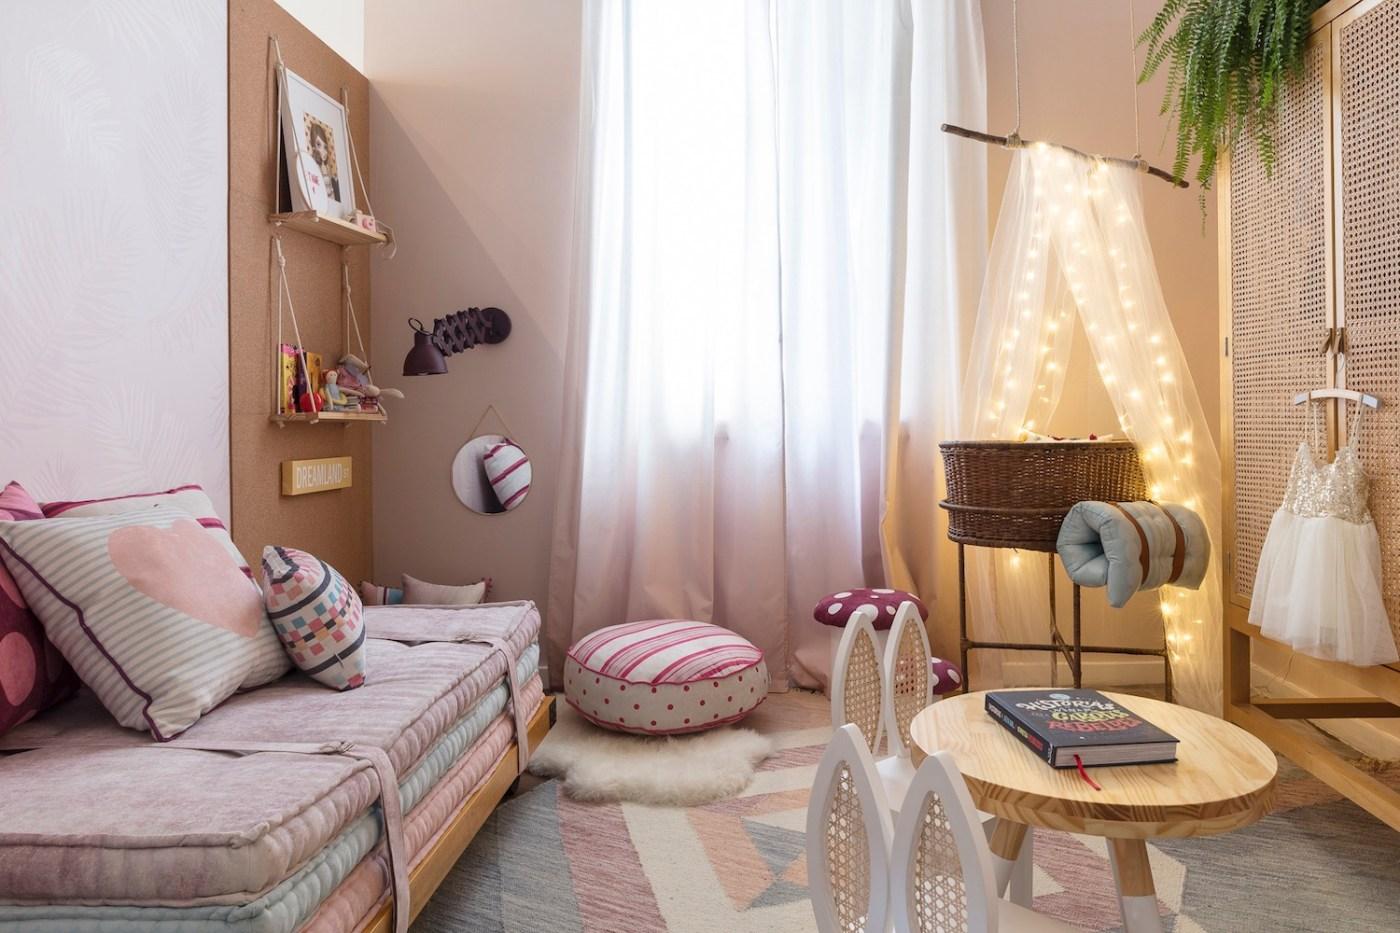 quarto-das-meninas-lanatoca-crissalles-naramaitre14